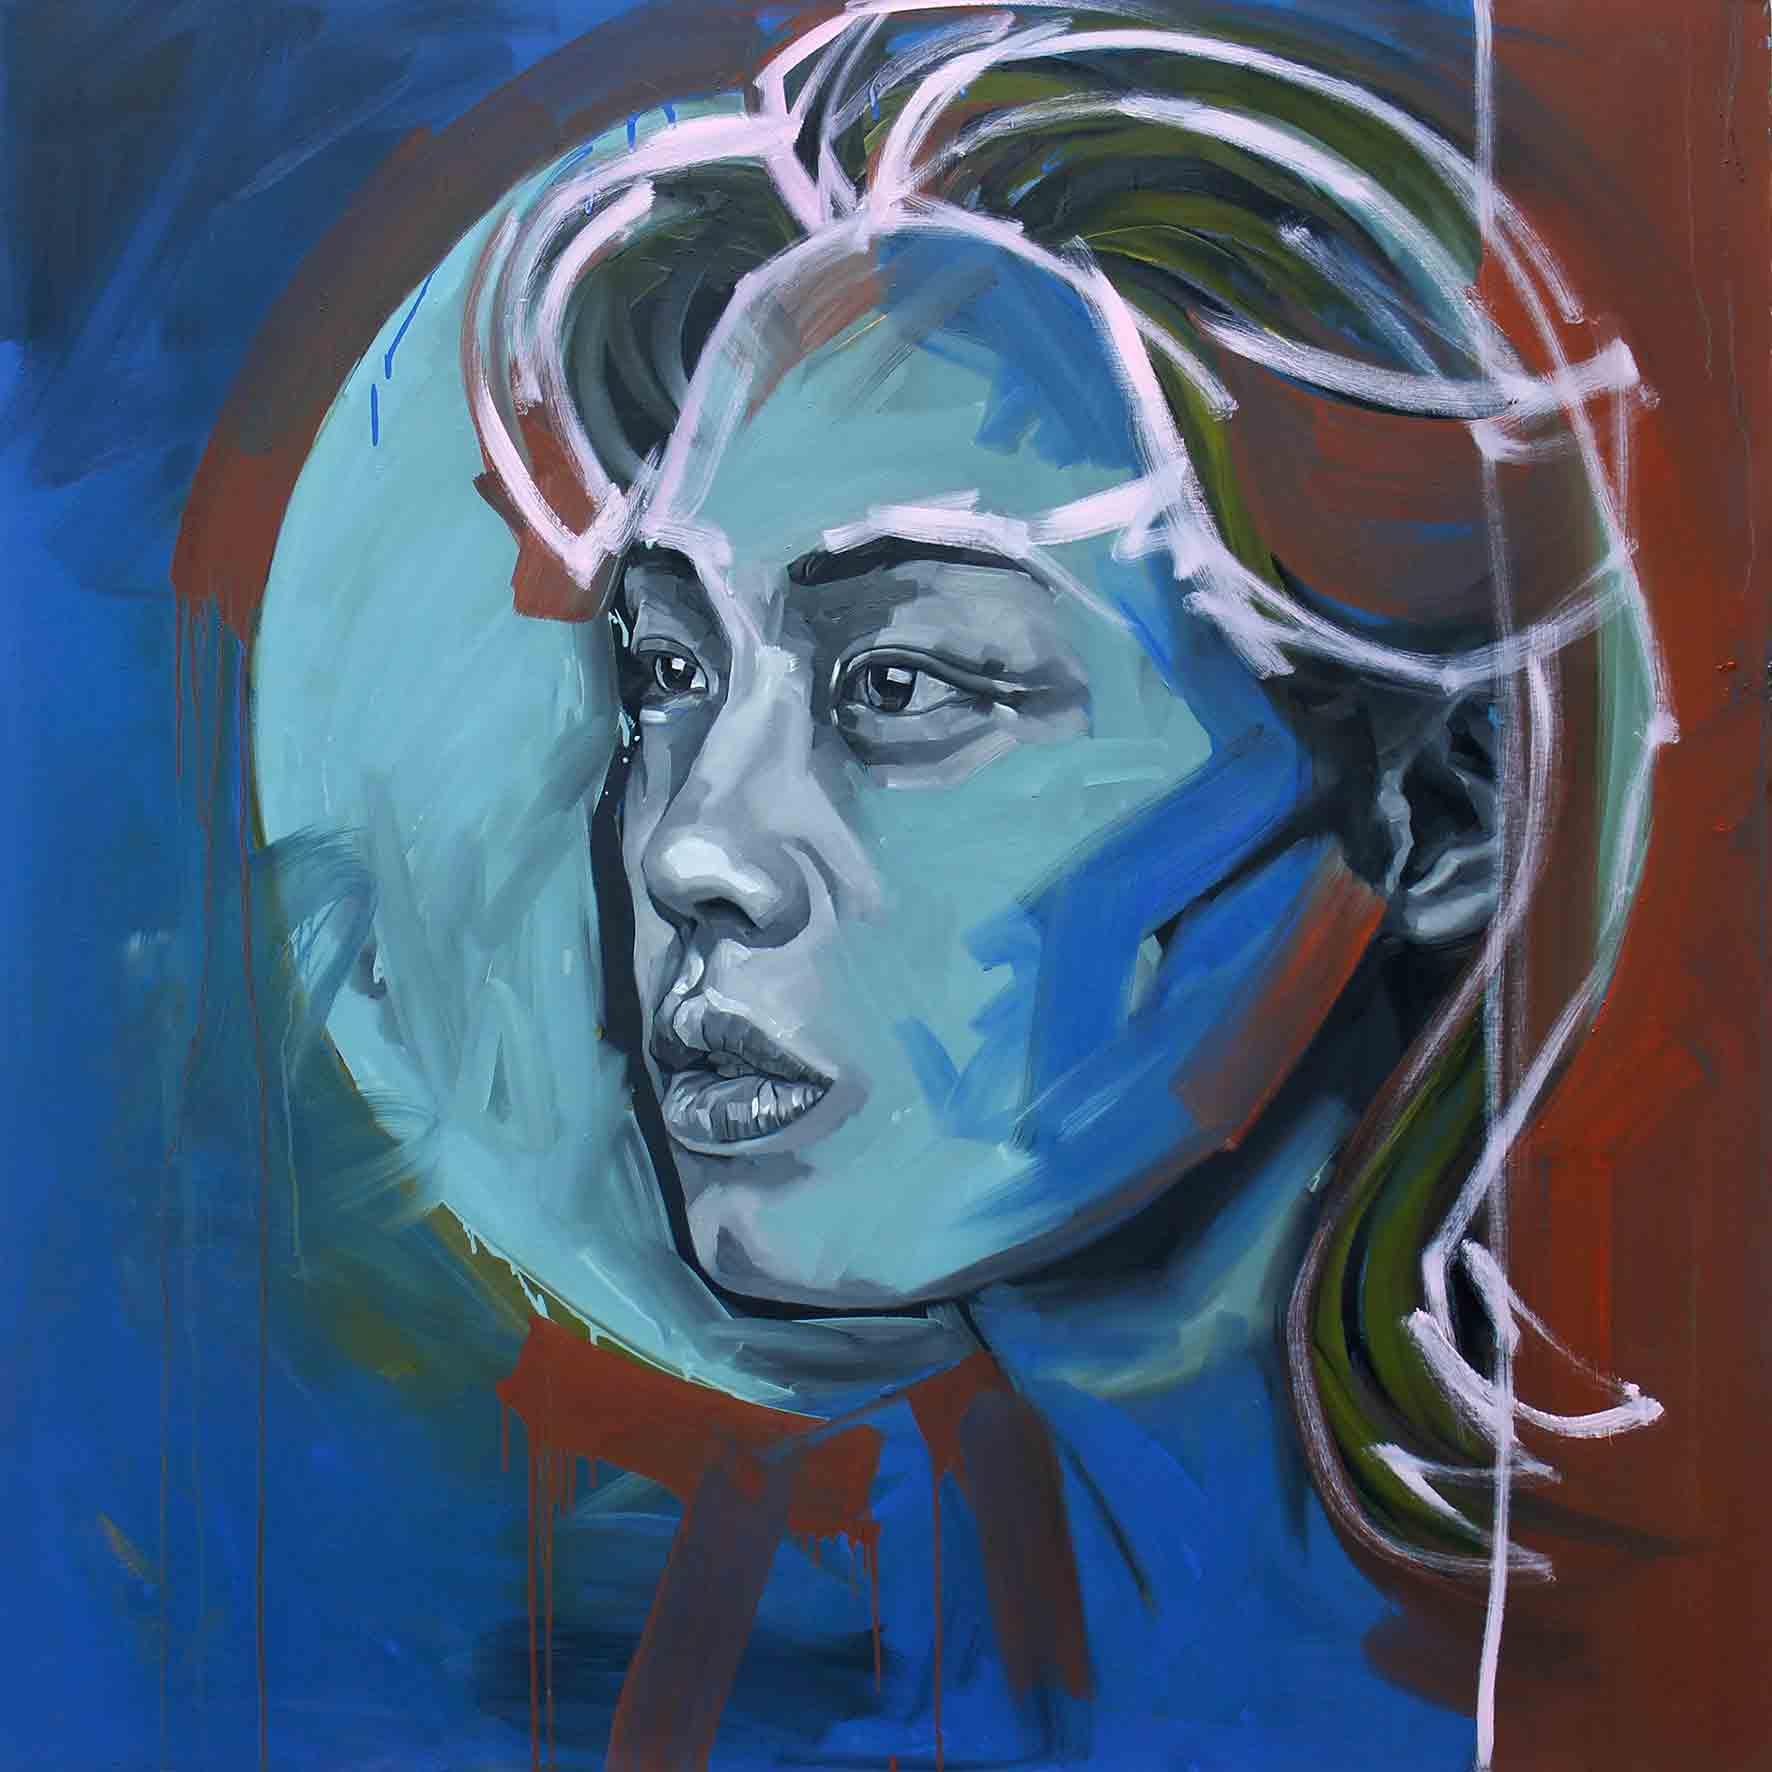 Rainy Blue, Oil on Canvas 48×48 inches